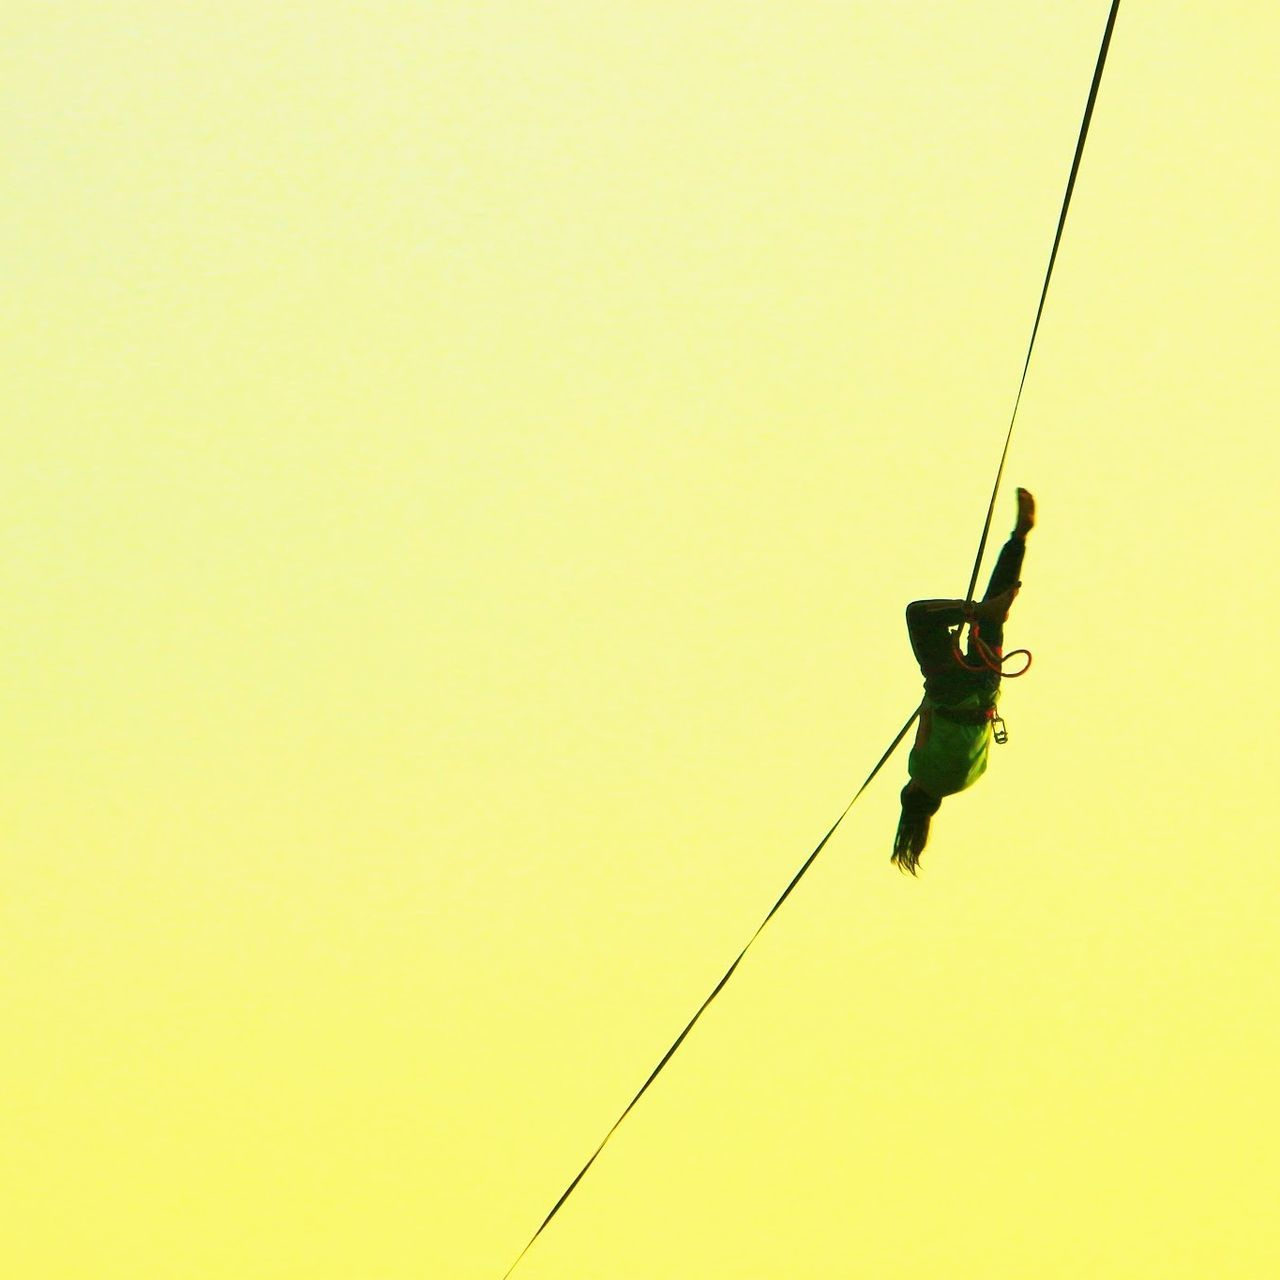 Slackline, Caida. 43 Golden Moments Slackline Caida Highline Longline Slaker Equilibrio Fall Panoramic Photography High Slacklife Slackvida Caminata Santiago Bosque Magico Landscape Nature Sky Air Sunset Walking Balance Color Of Sport